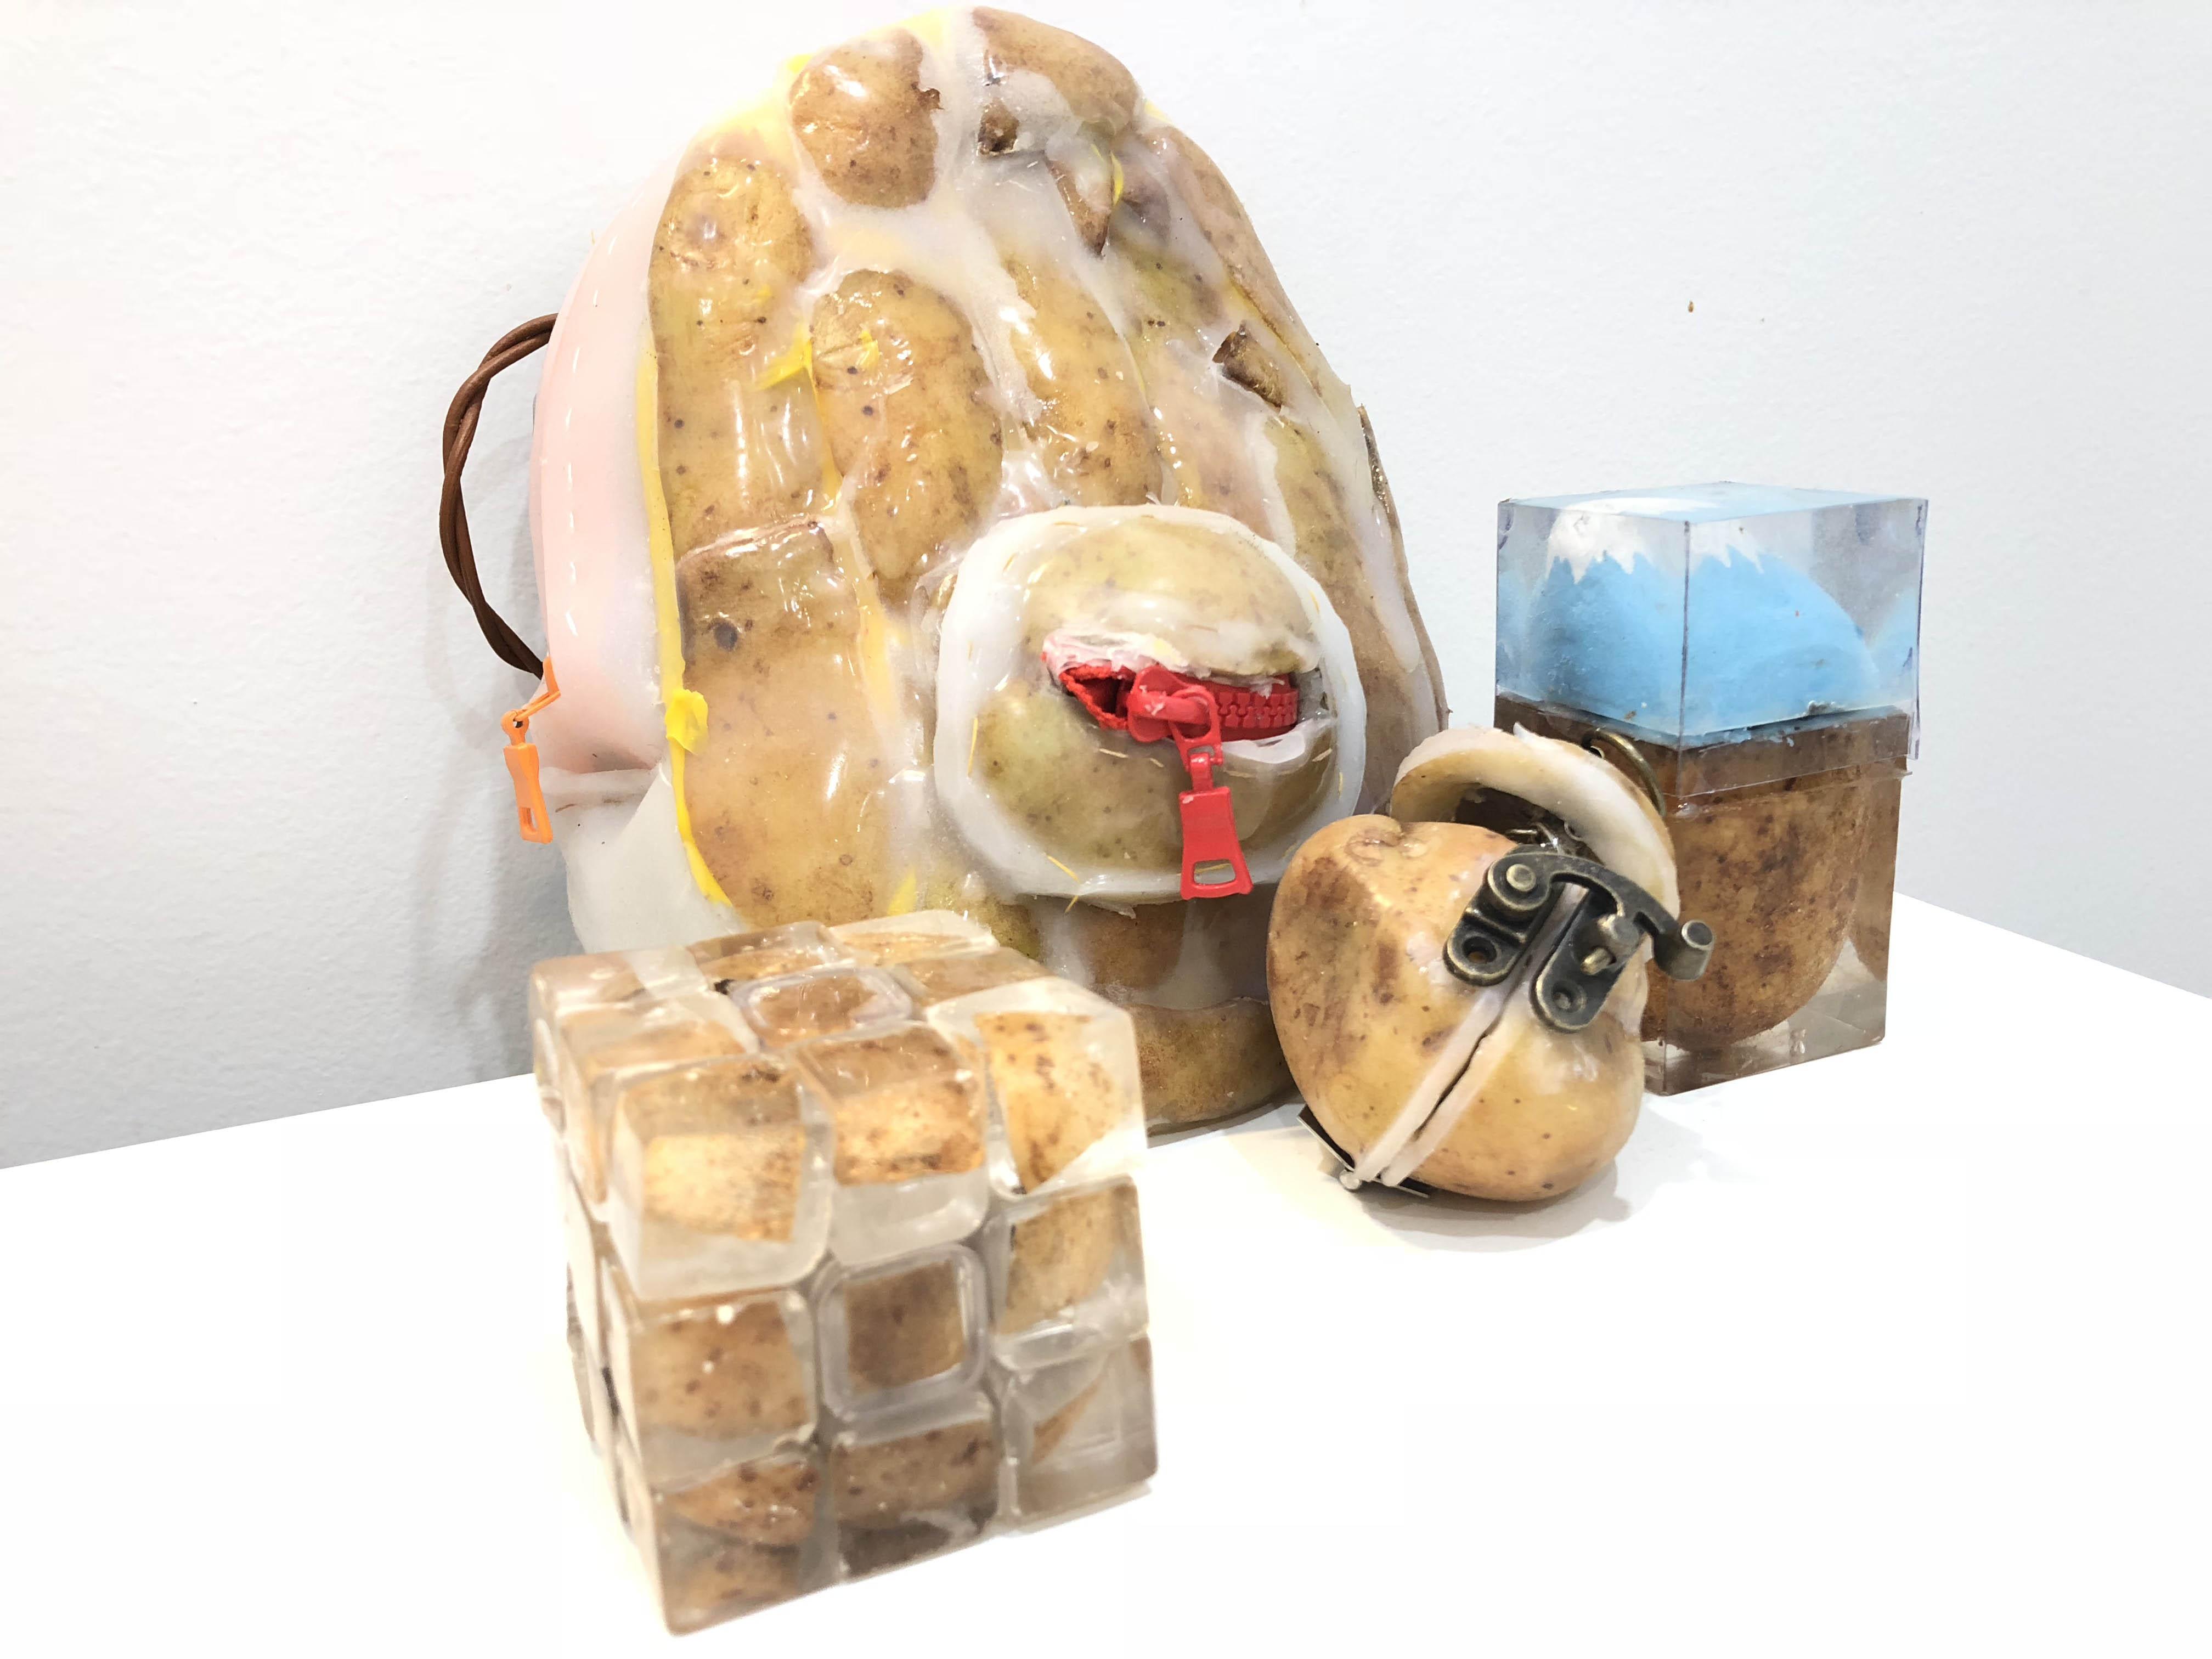 Imperfect potato product design